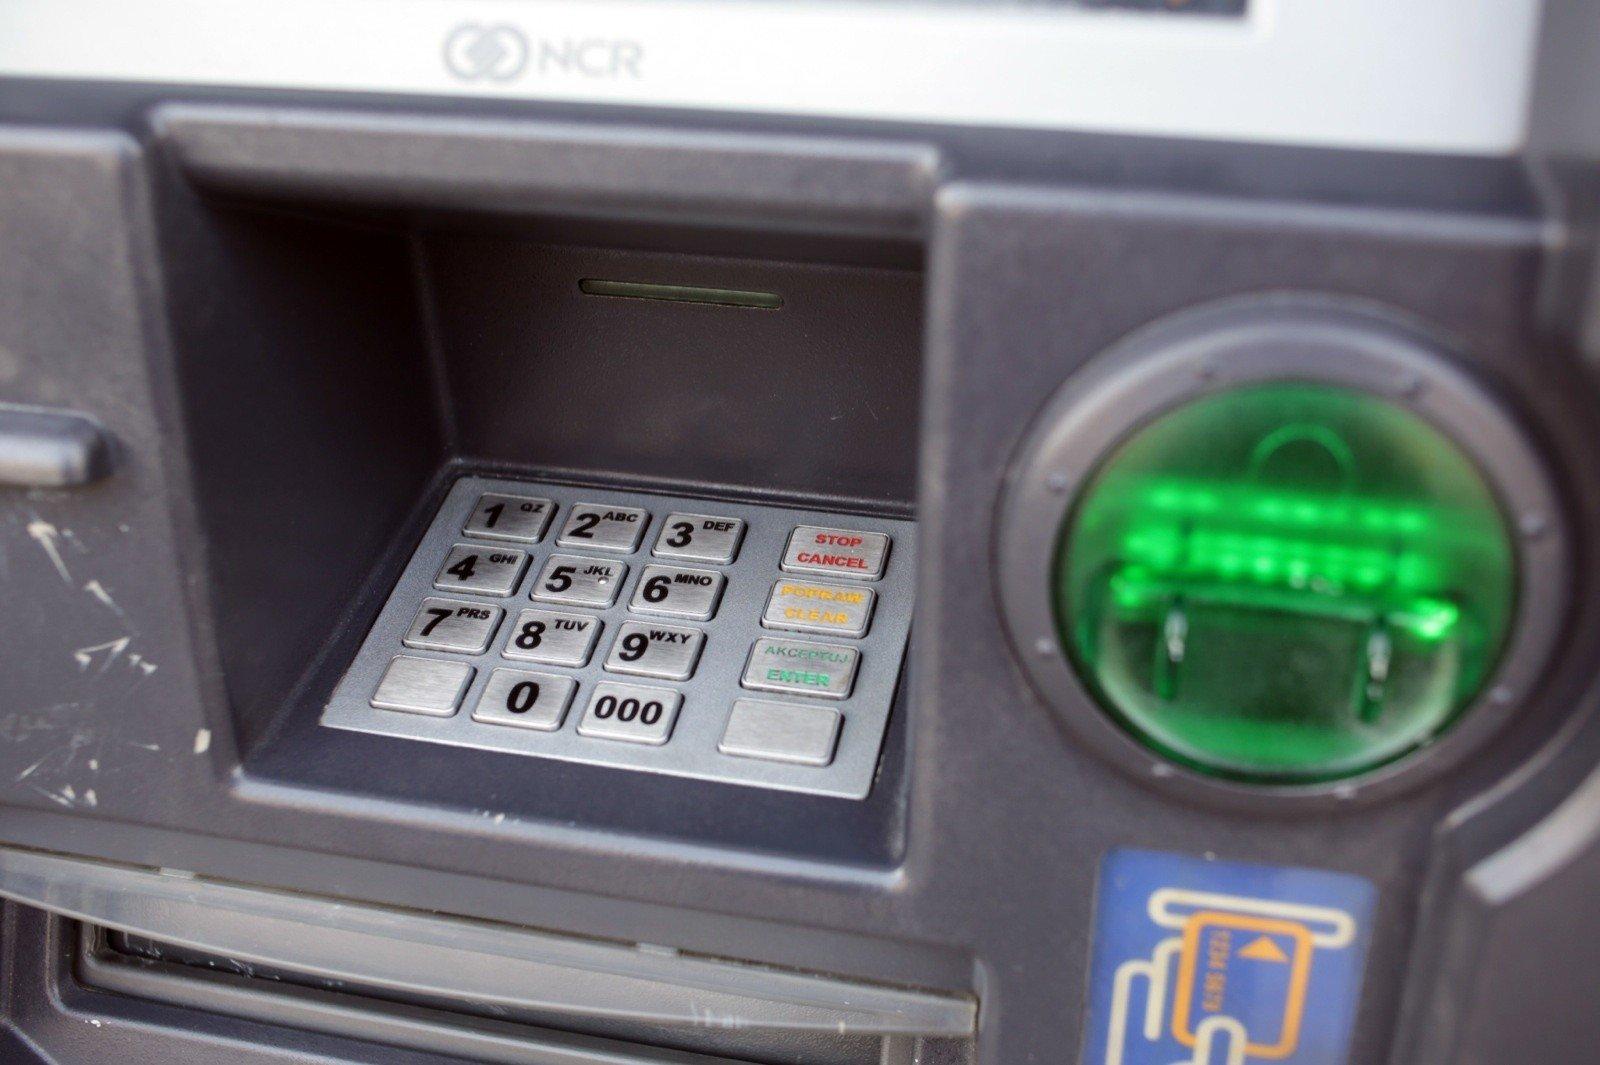 Santander Bank warns: Are you withdrawing cash at an ATM